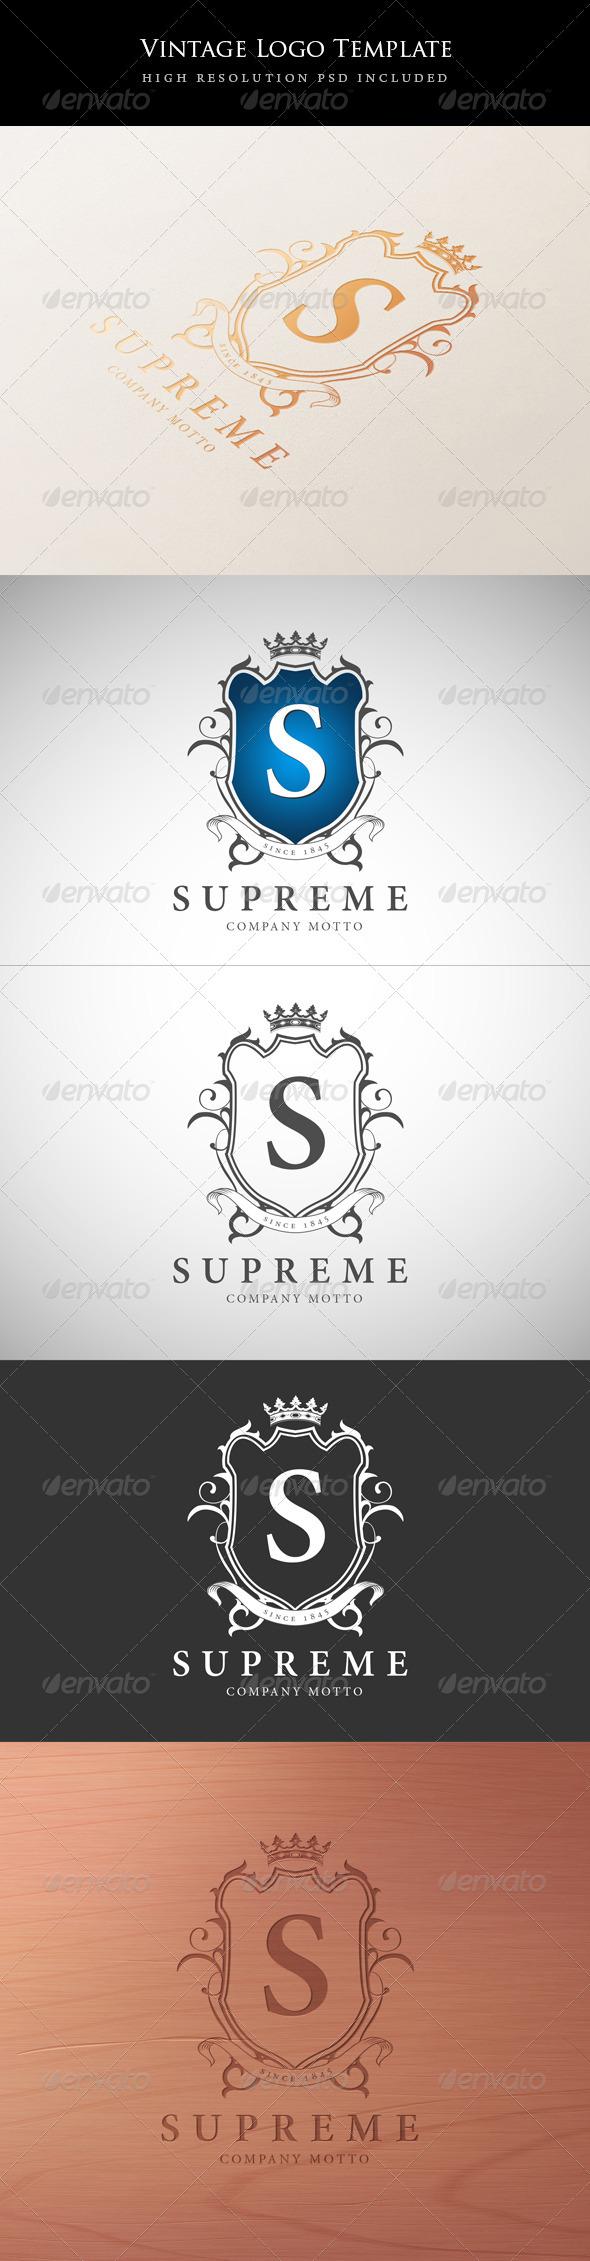 GraphicRiver Vintage Logo Template 5958089